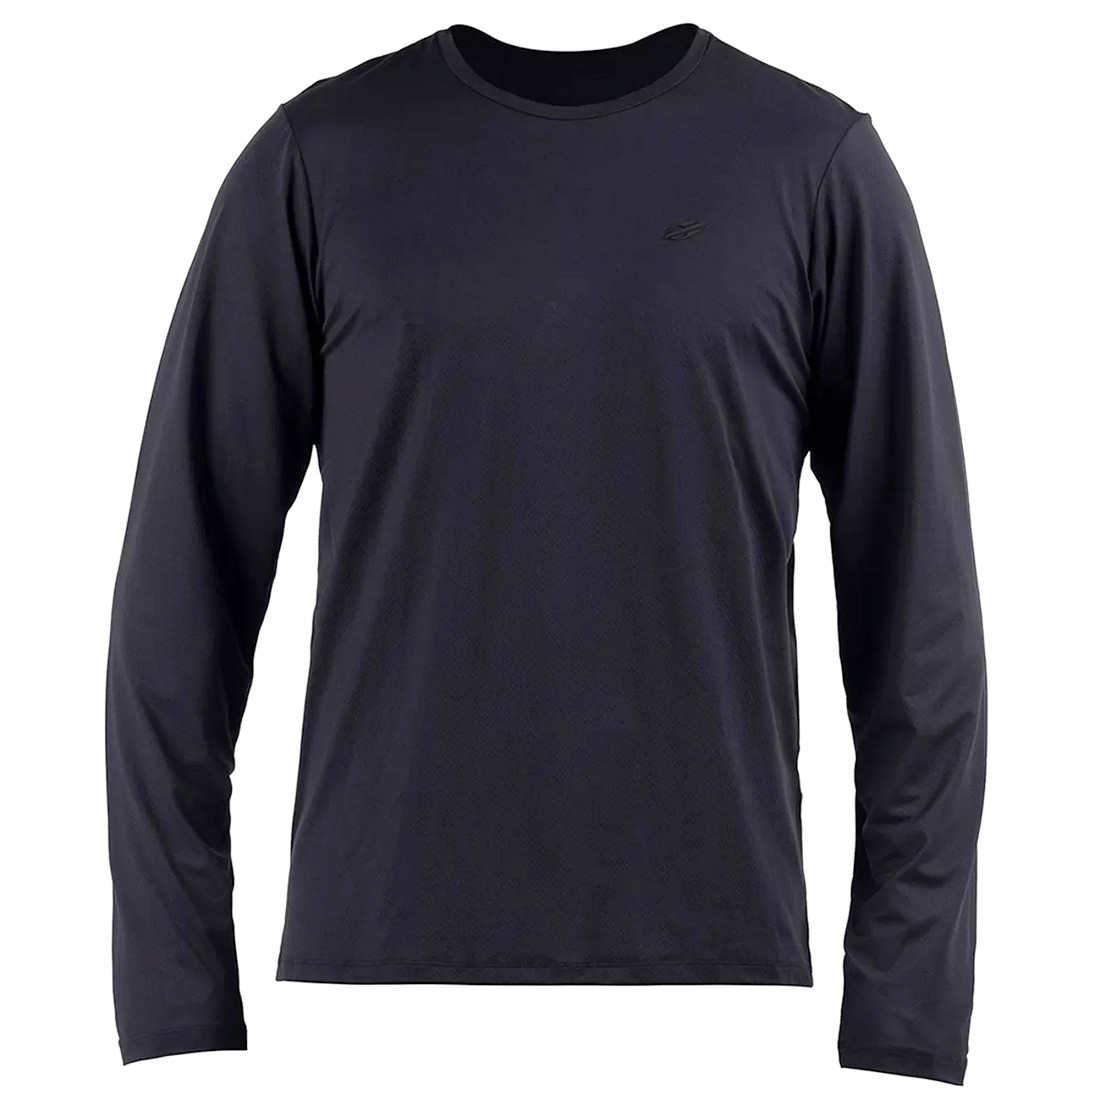 Camisa Manga Longa Dry Action 3a uv Mormaii Masculino - Preto   Prancharia